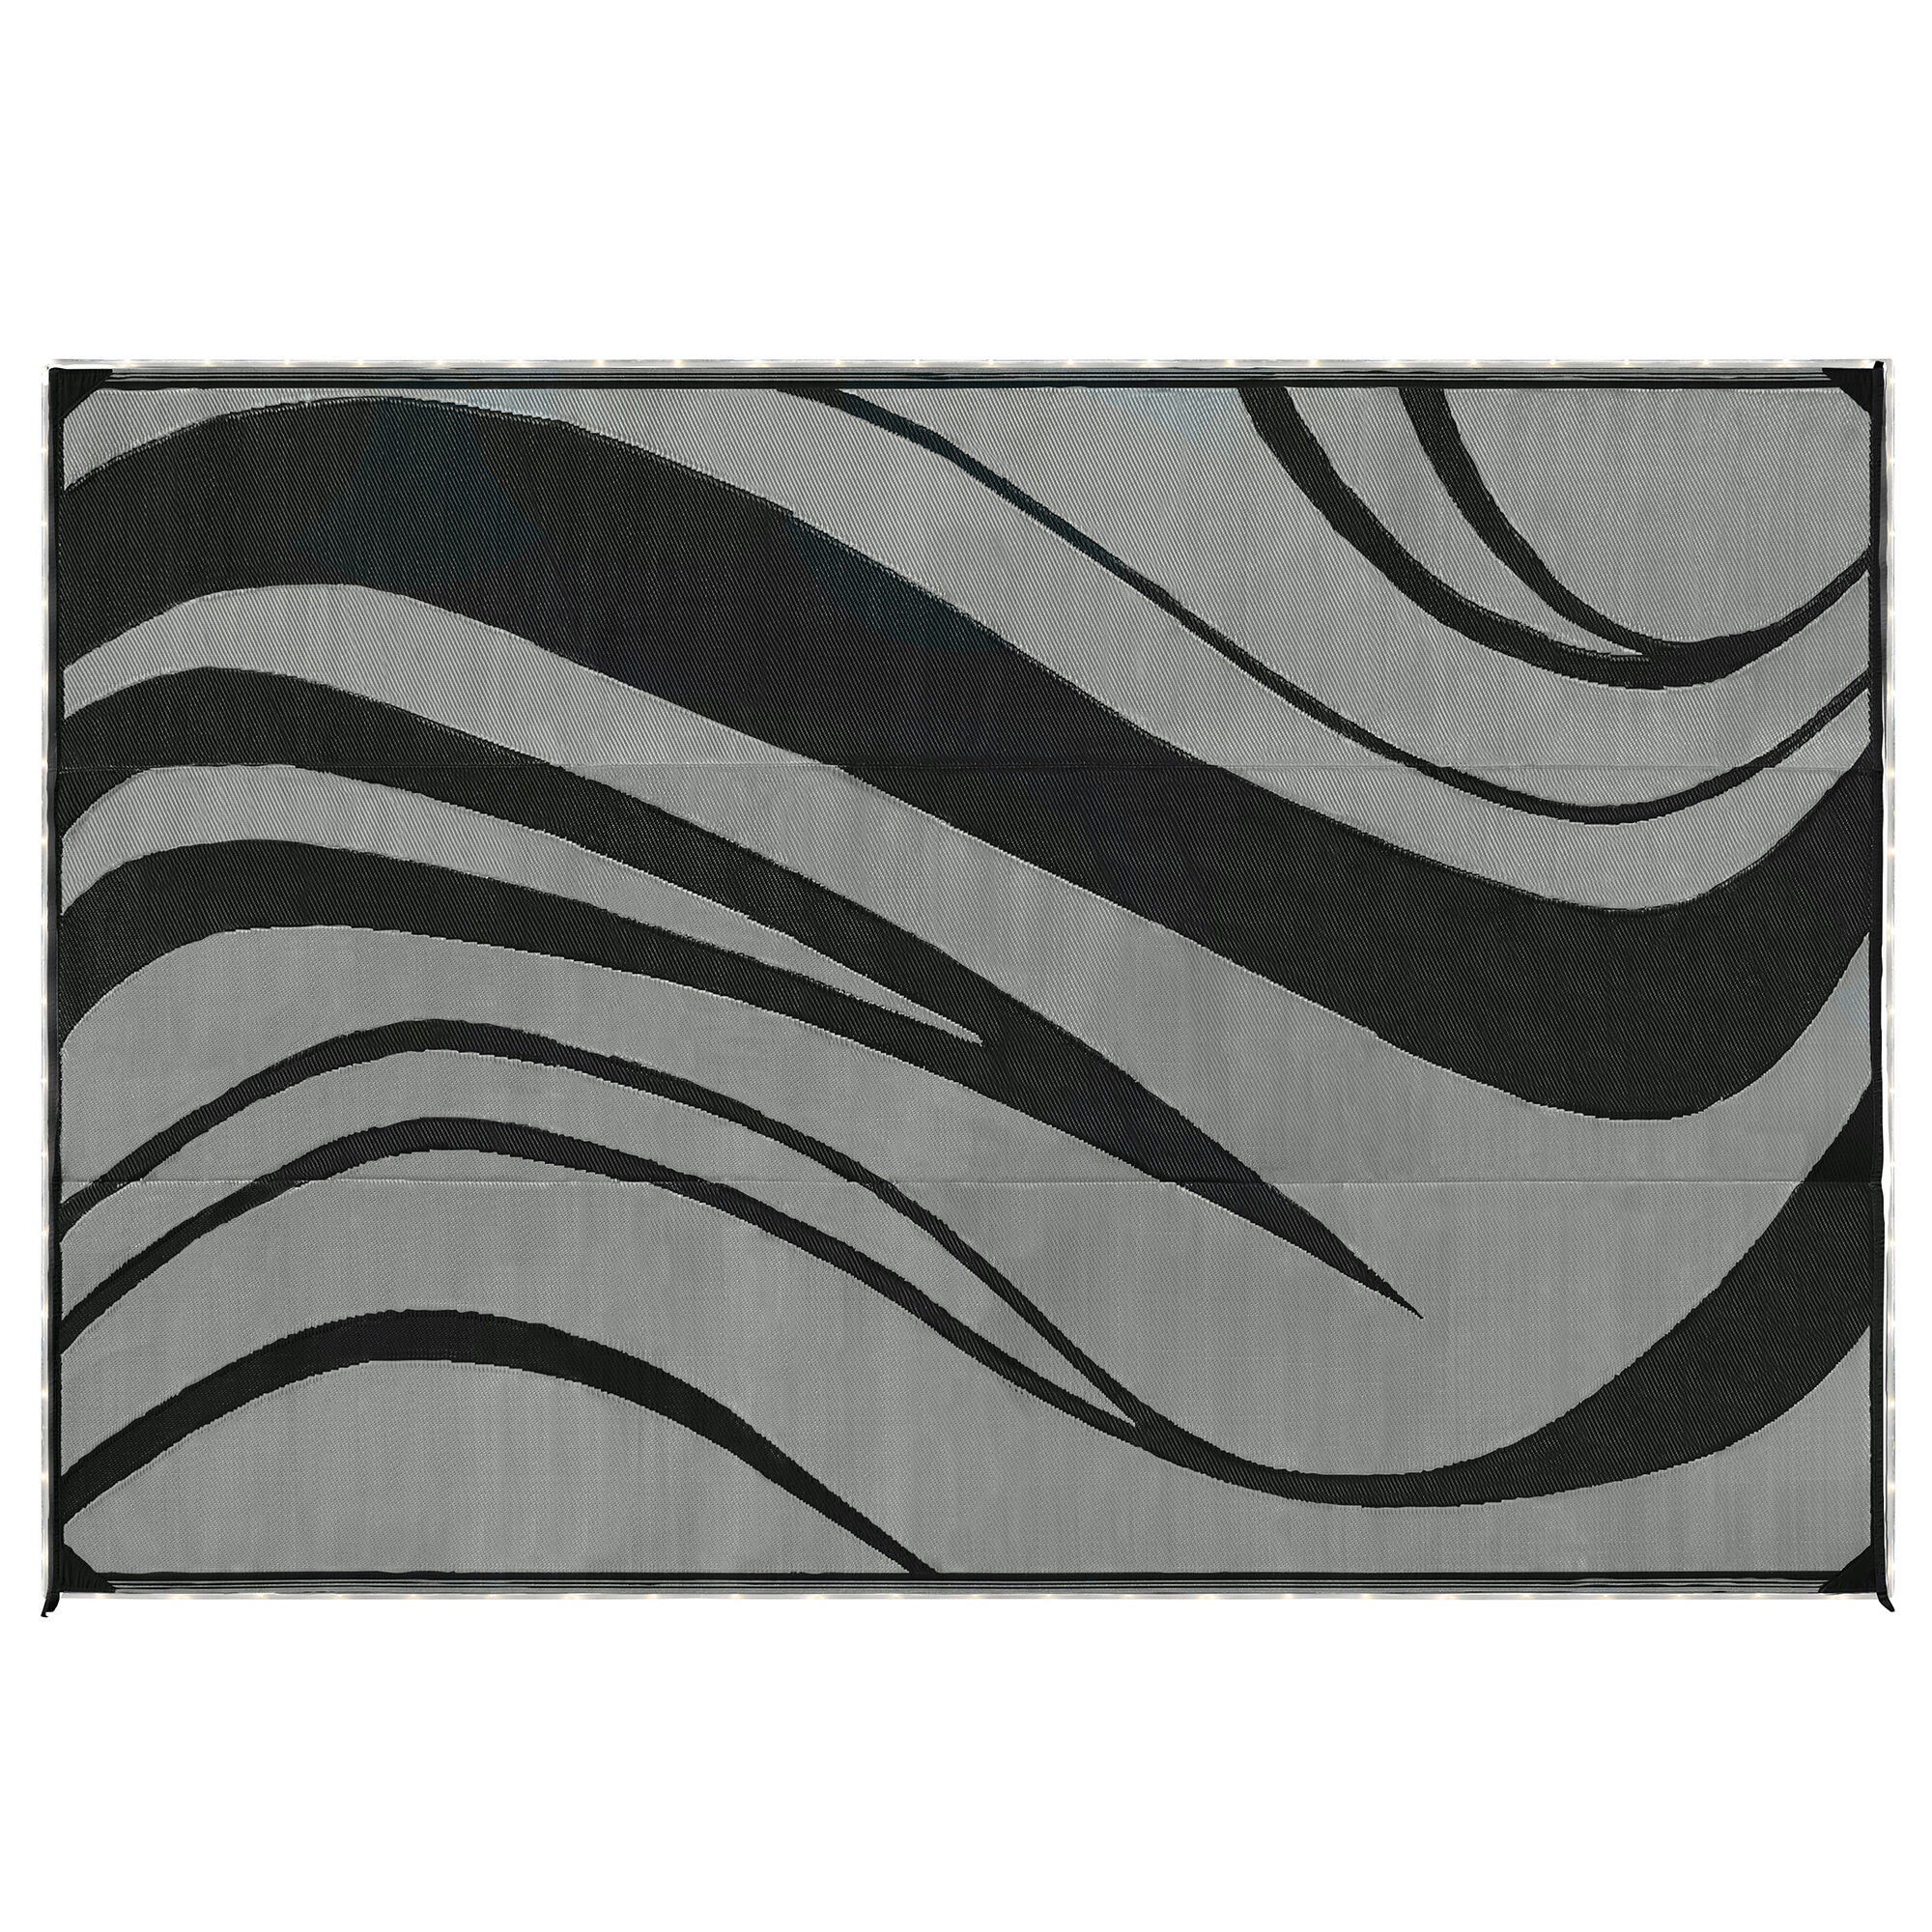 led illuminated patio mat with wave design 9 x 12